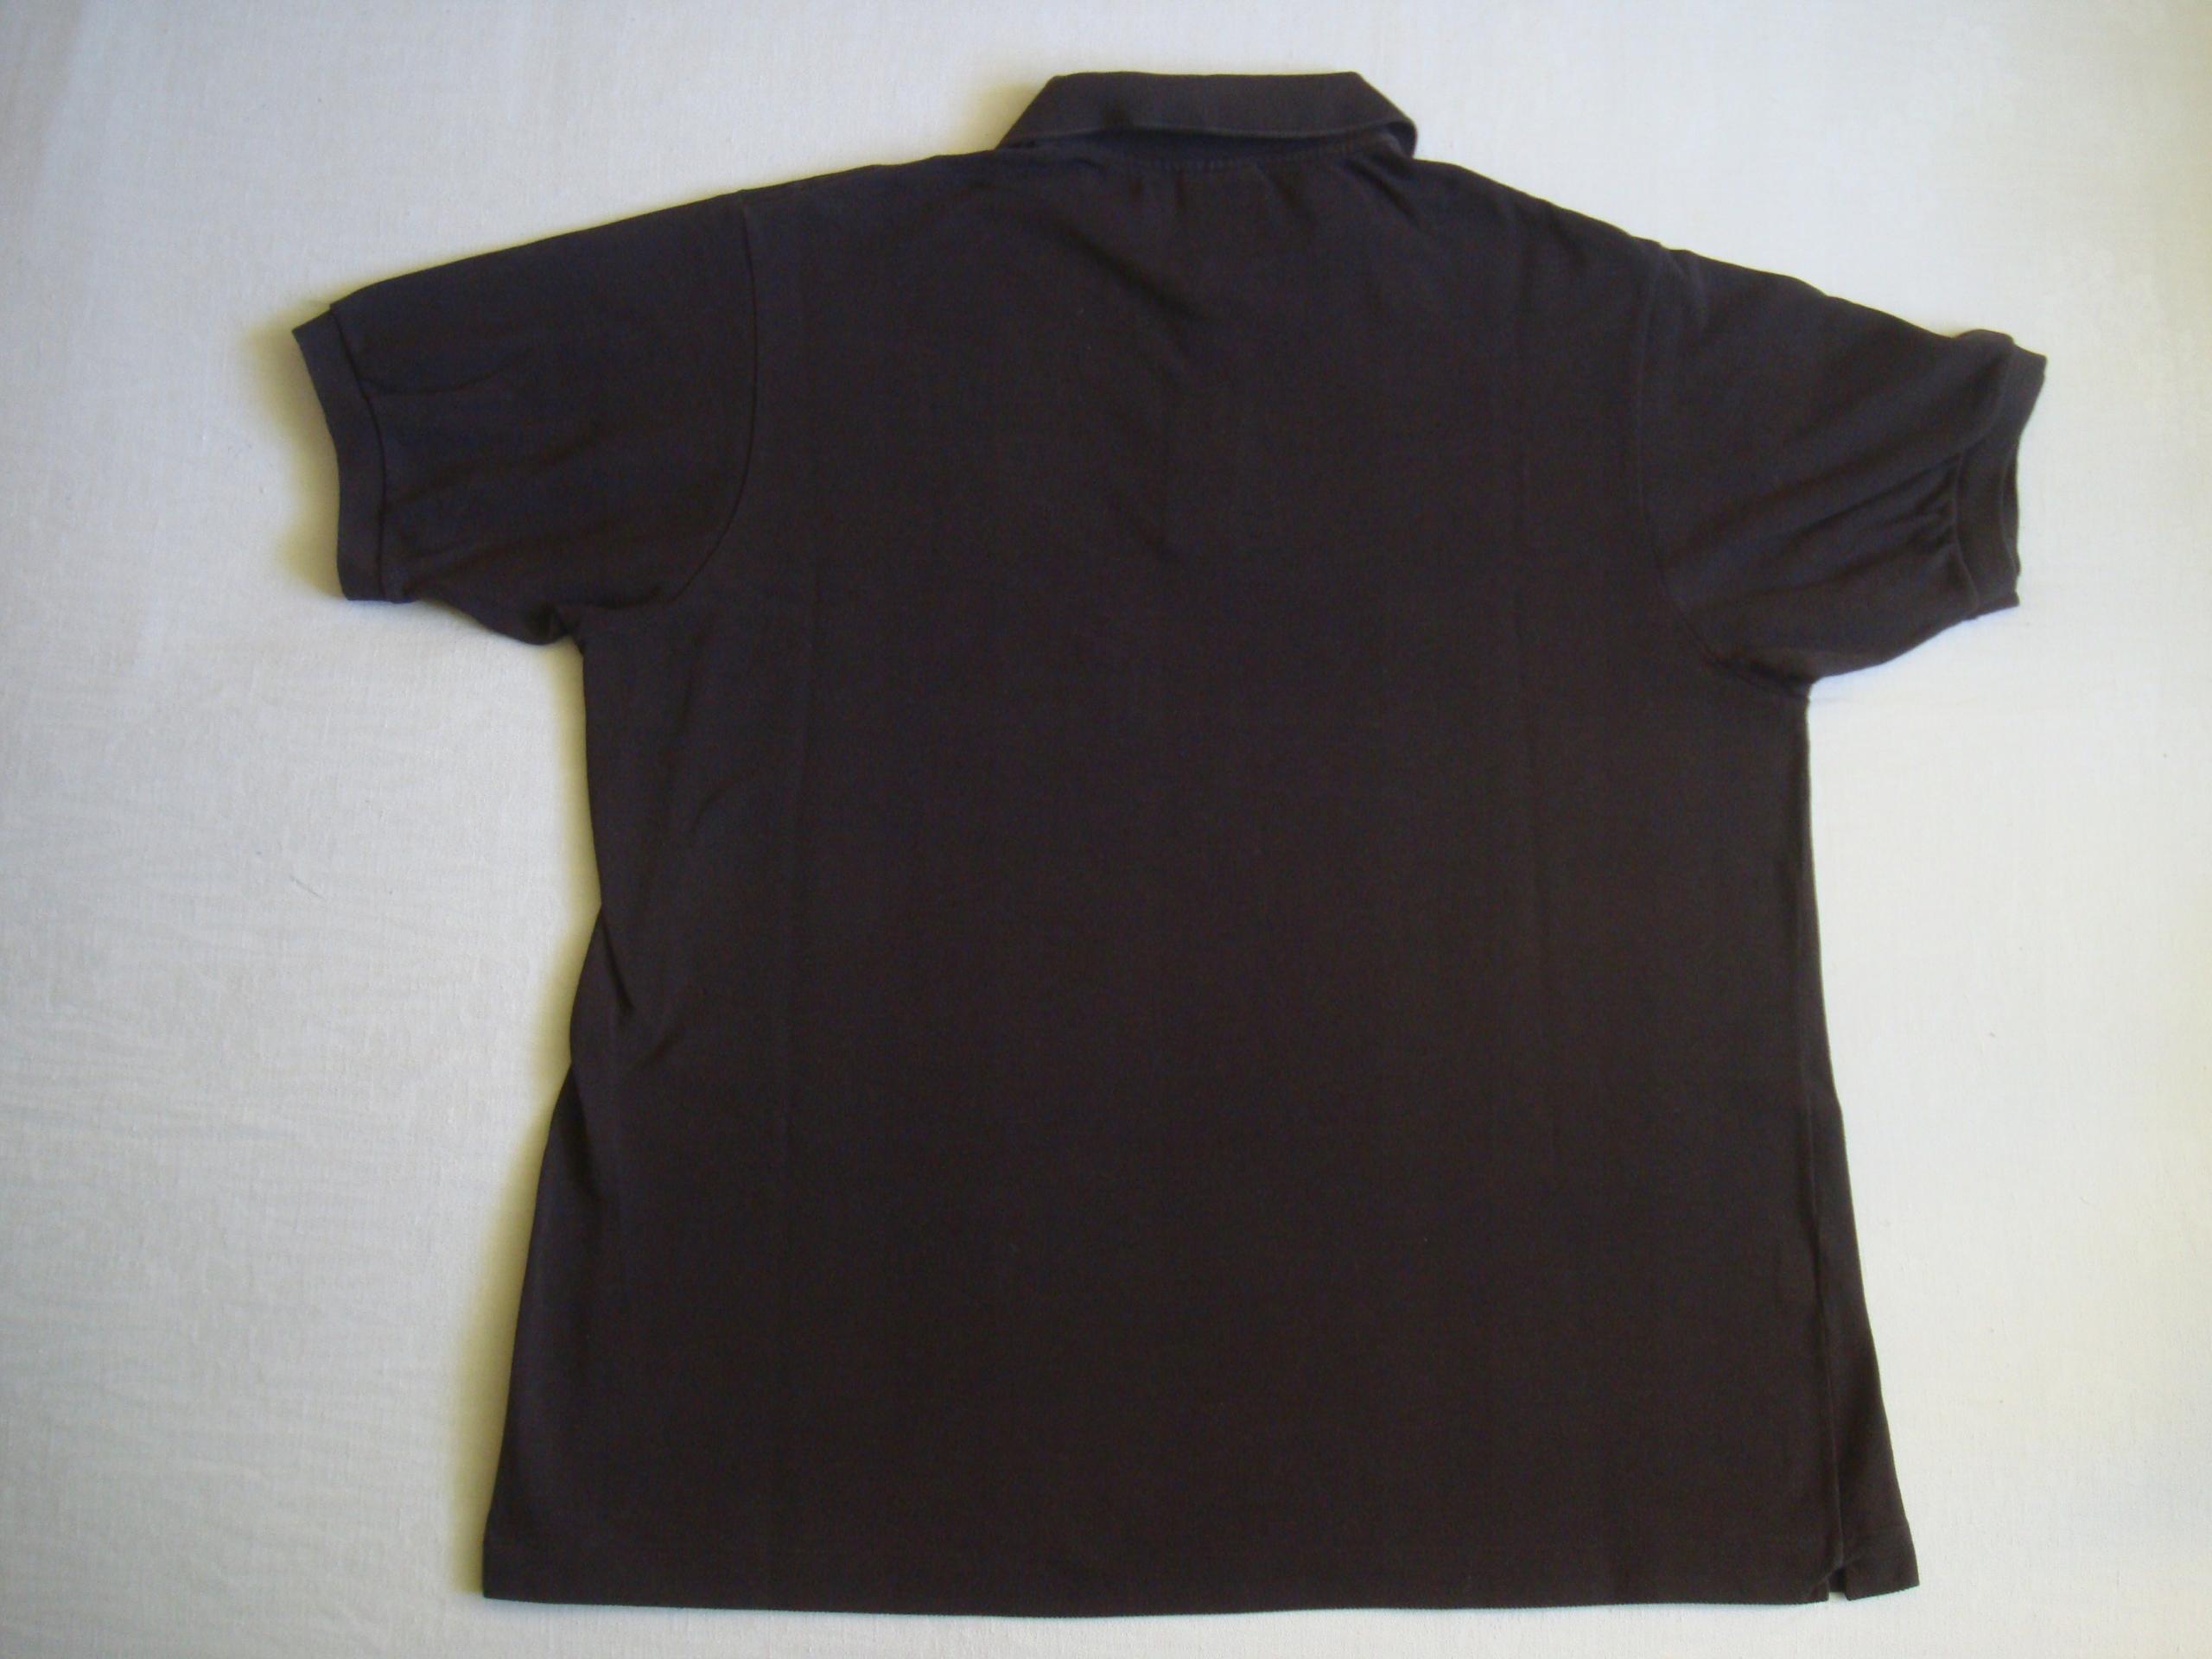 063e2d6c8 Lacoste koszulka polo rozmiar 6 (XL) - 7760850901 - oficjalne ...